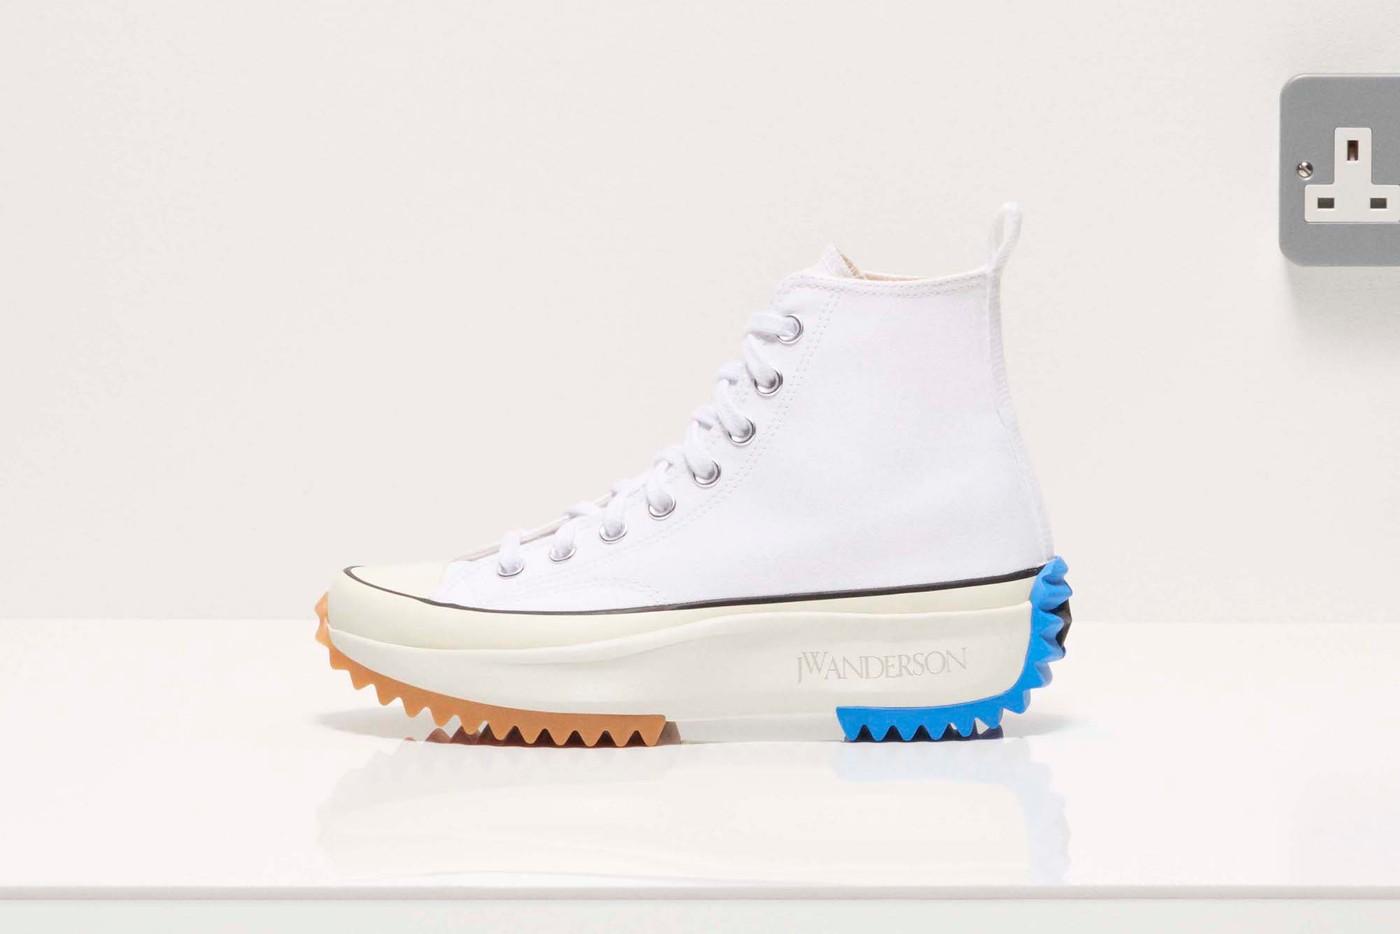 jw Anderson converse run star hike sneaker cap bag restock